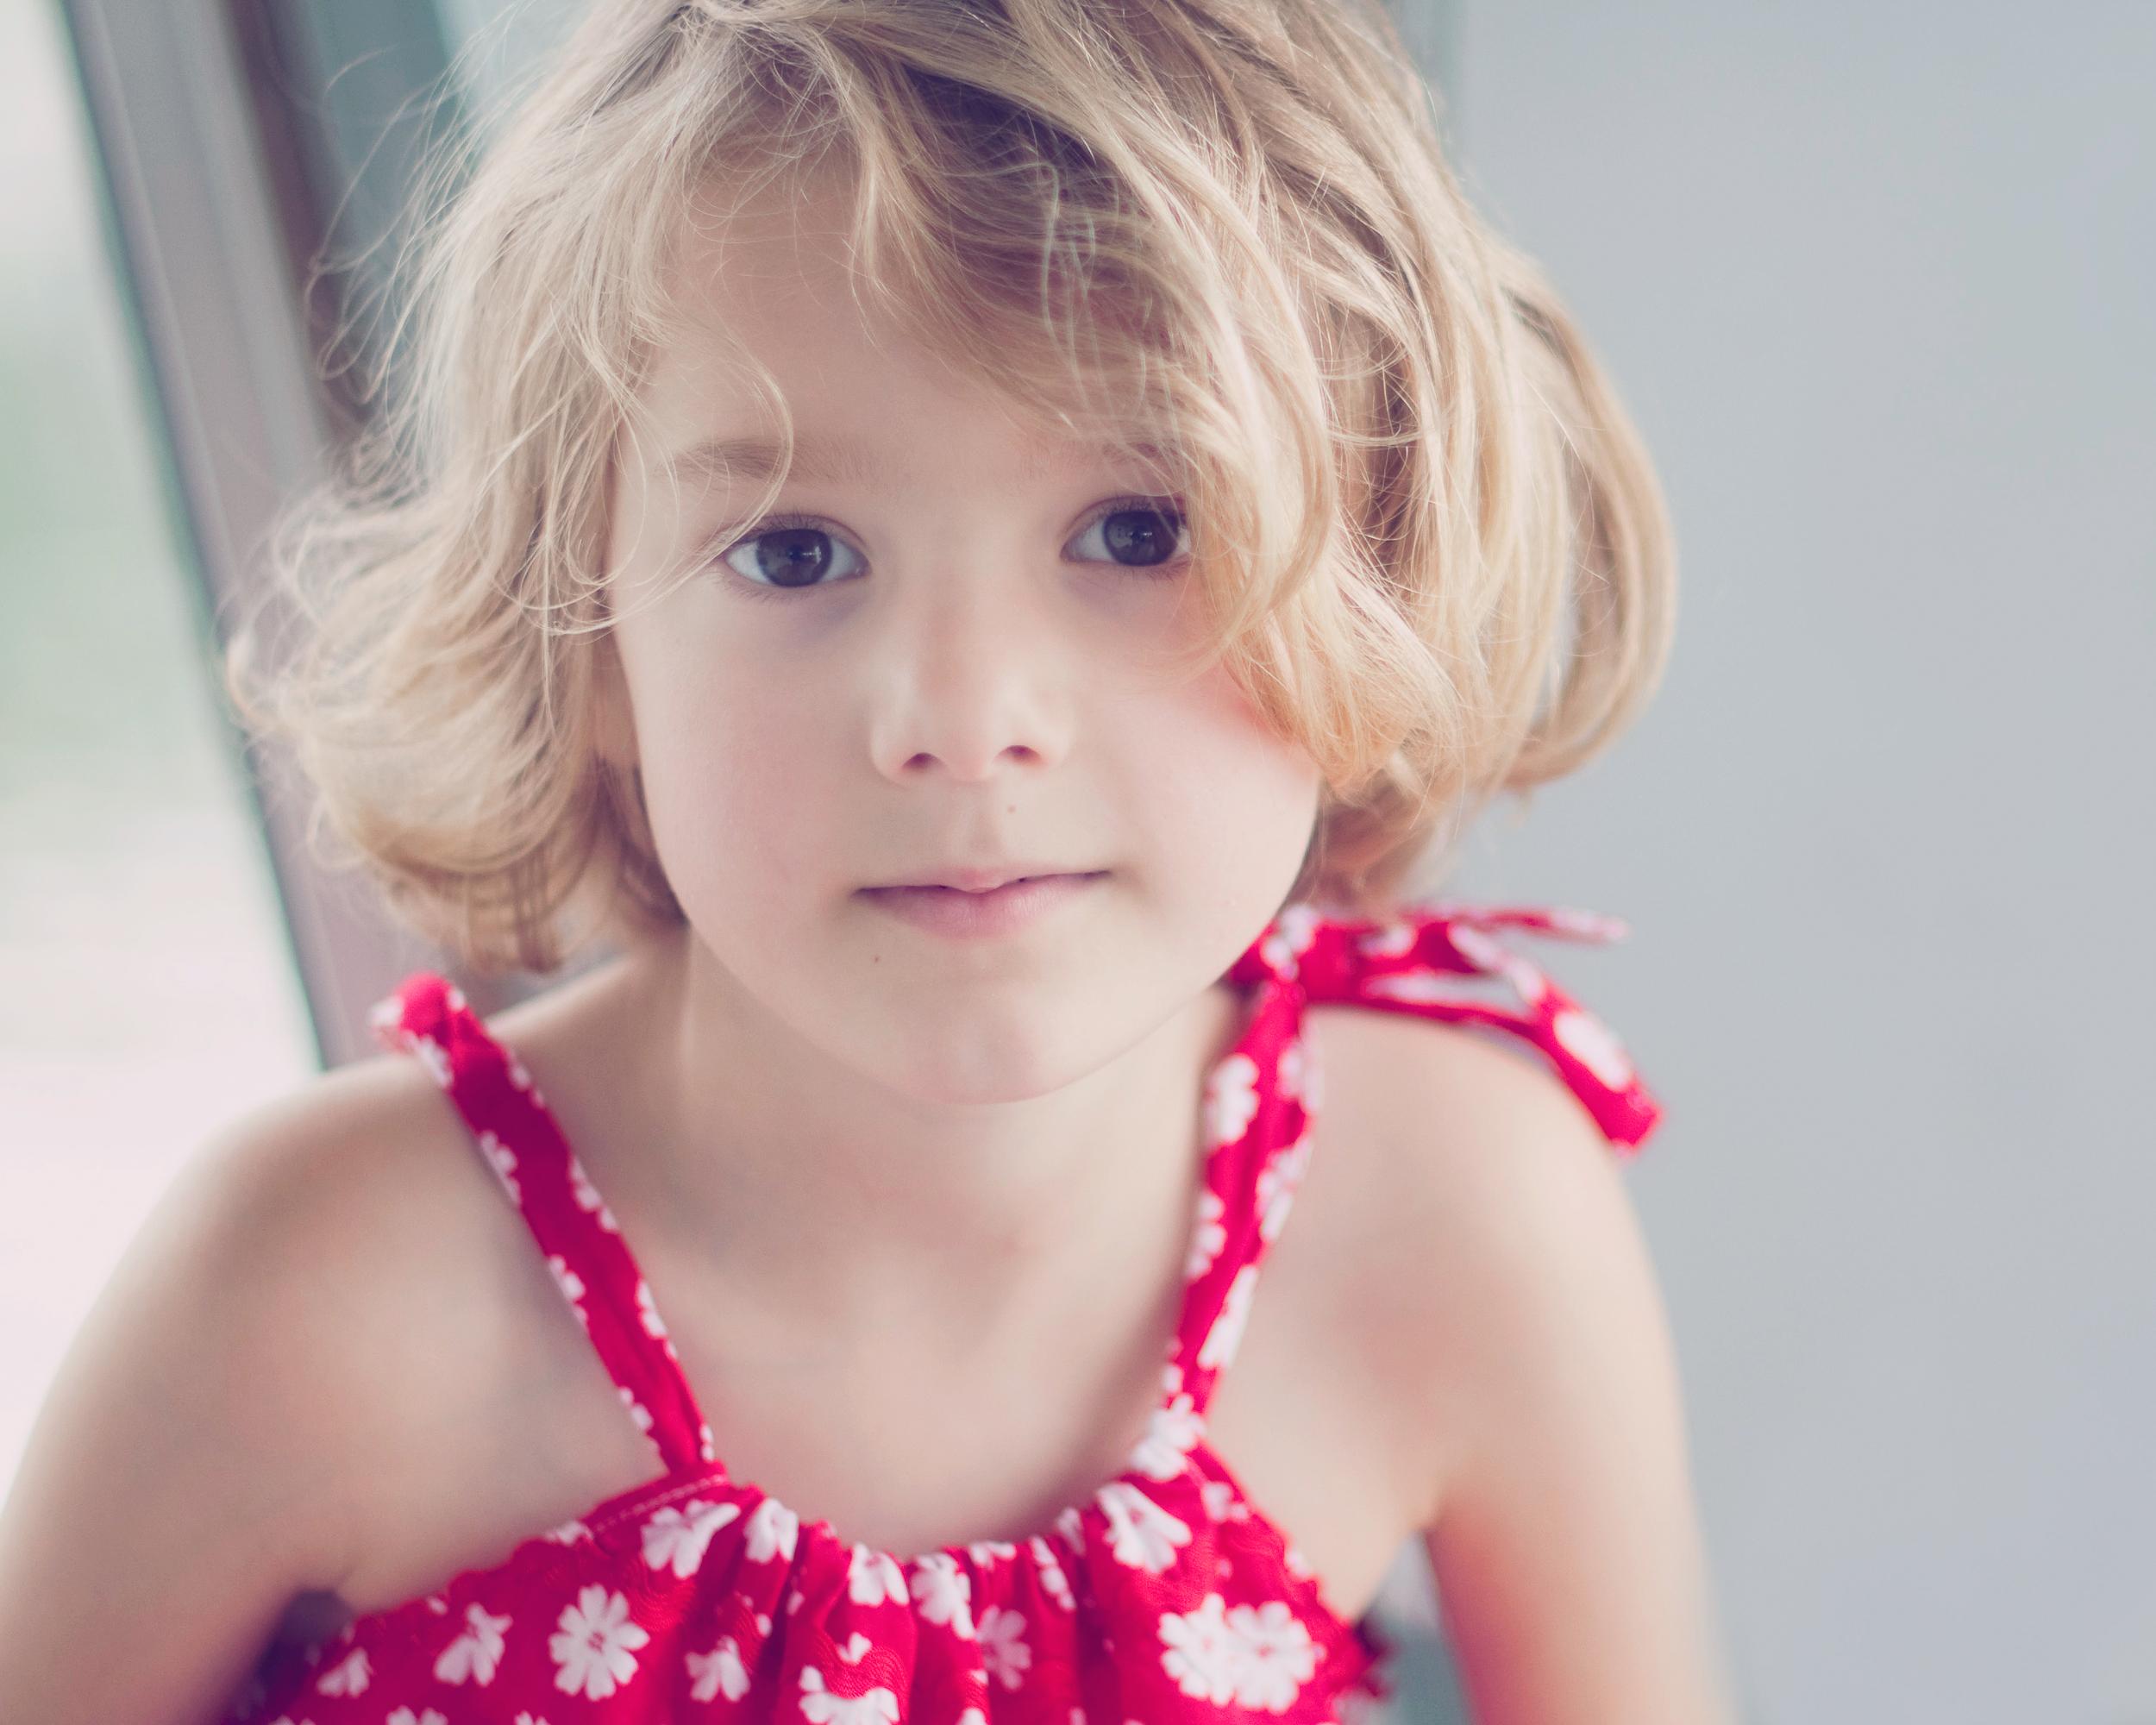 seattle-children-photographer-4.jpg